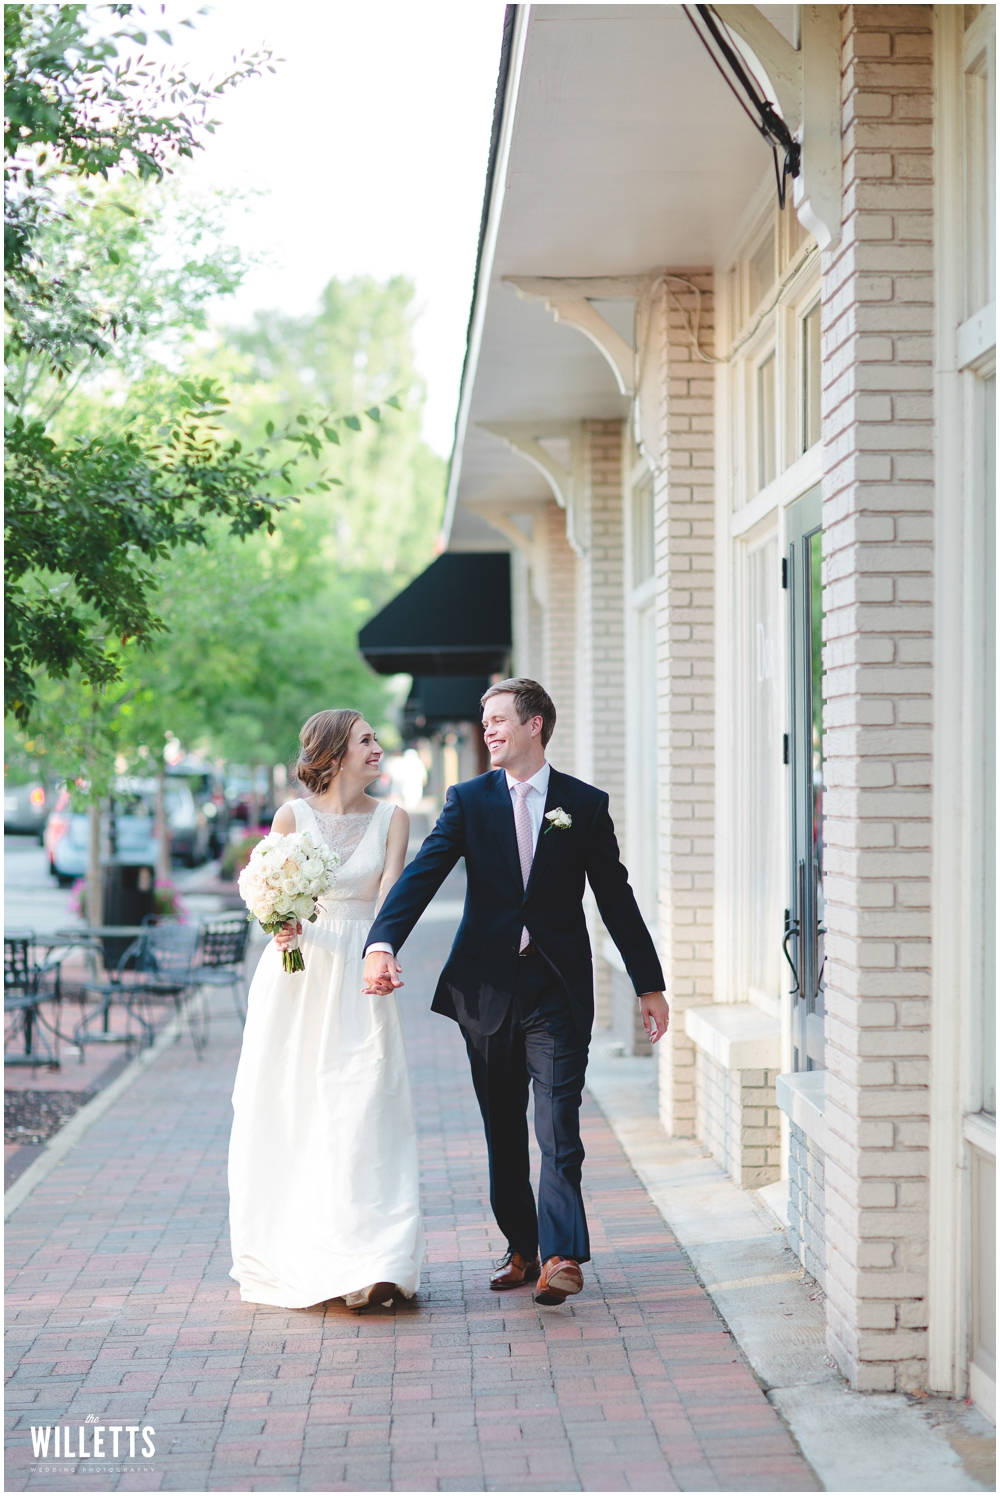 theWILLETTS_THE_BRICKYARD_WEDDINGS38.jpg